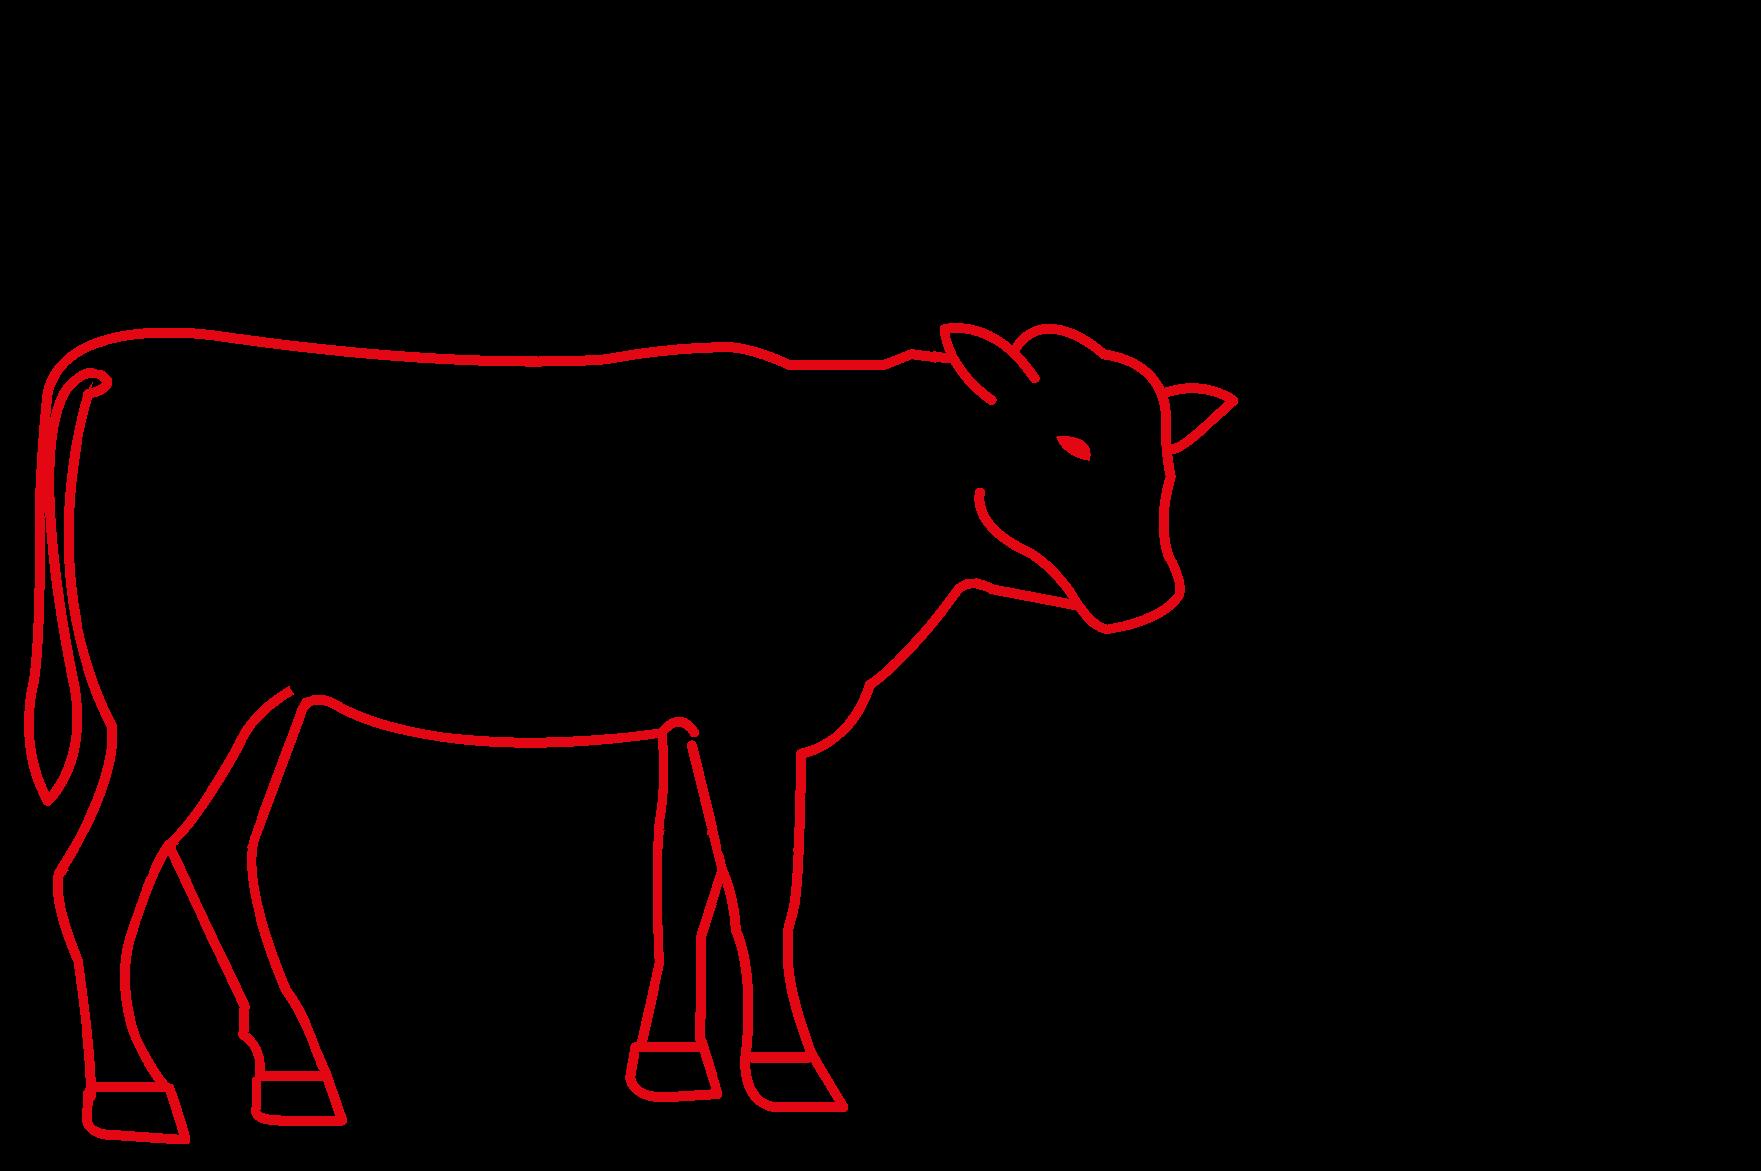 <a href='https://www.lanzasrl.com/it/vitello'> Vitello</a>